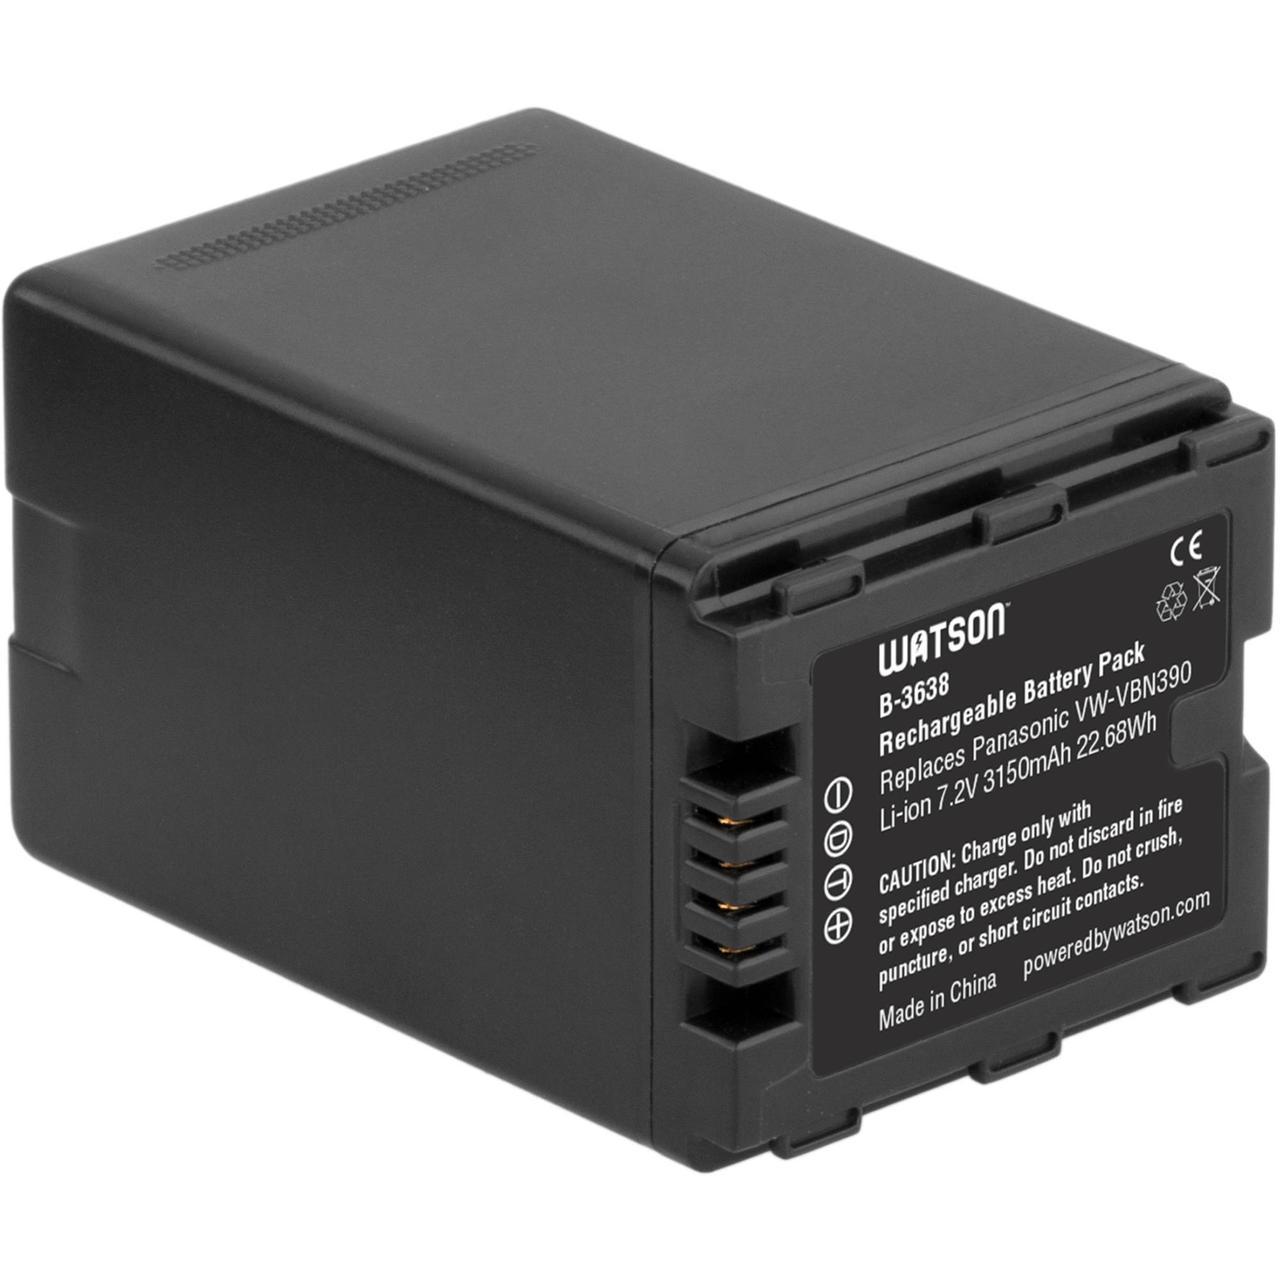 Батарейка (аккумулятор) Panasonic VBN390 (4000 mAh)